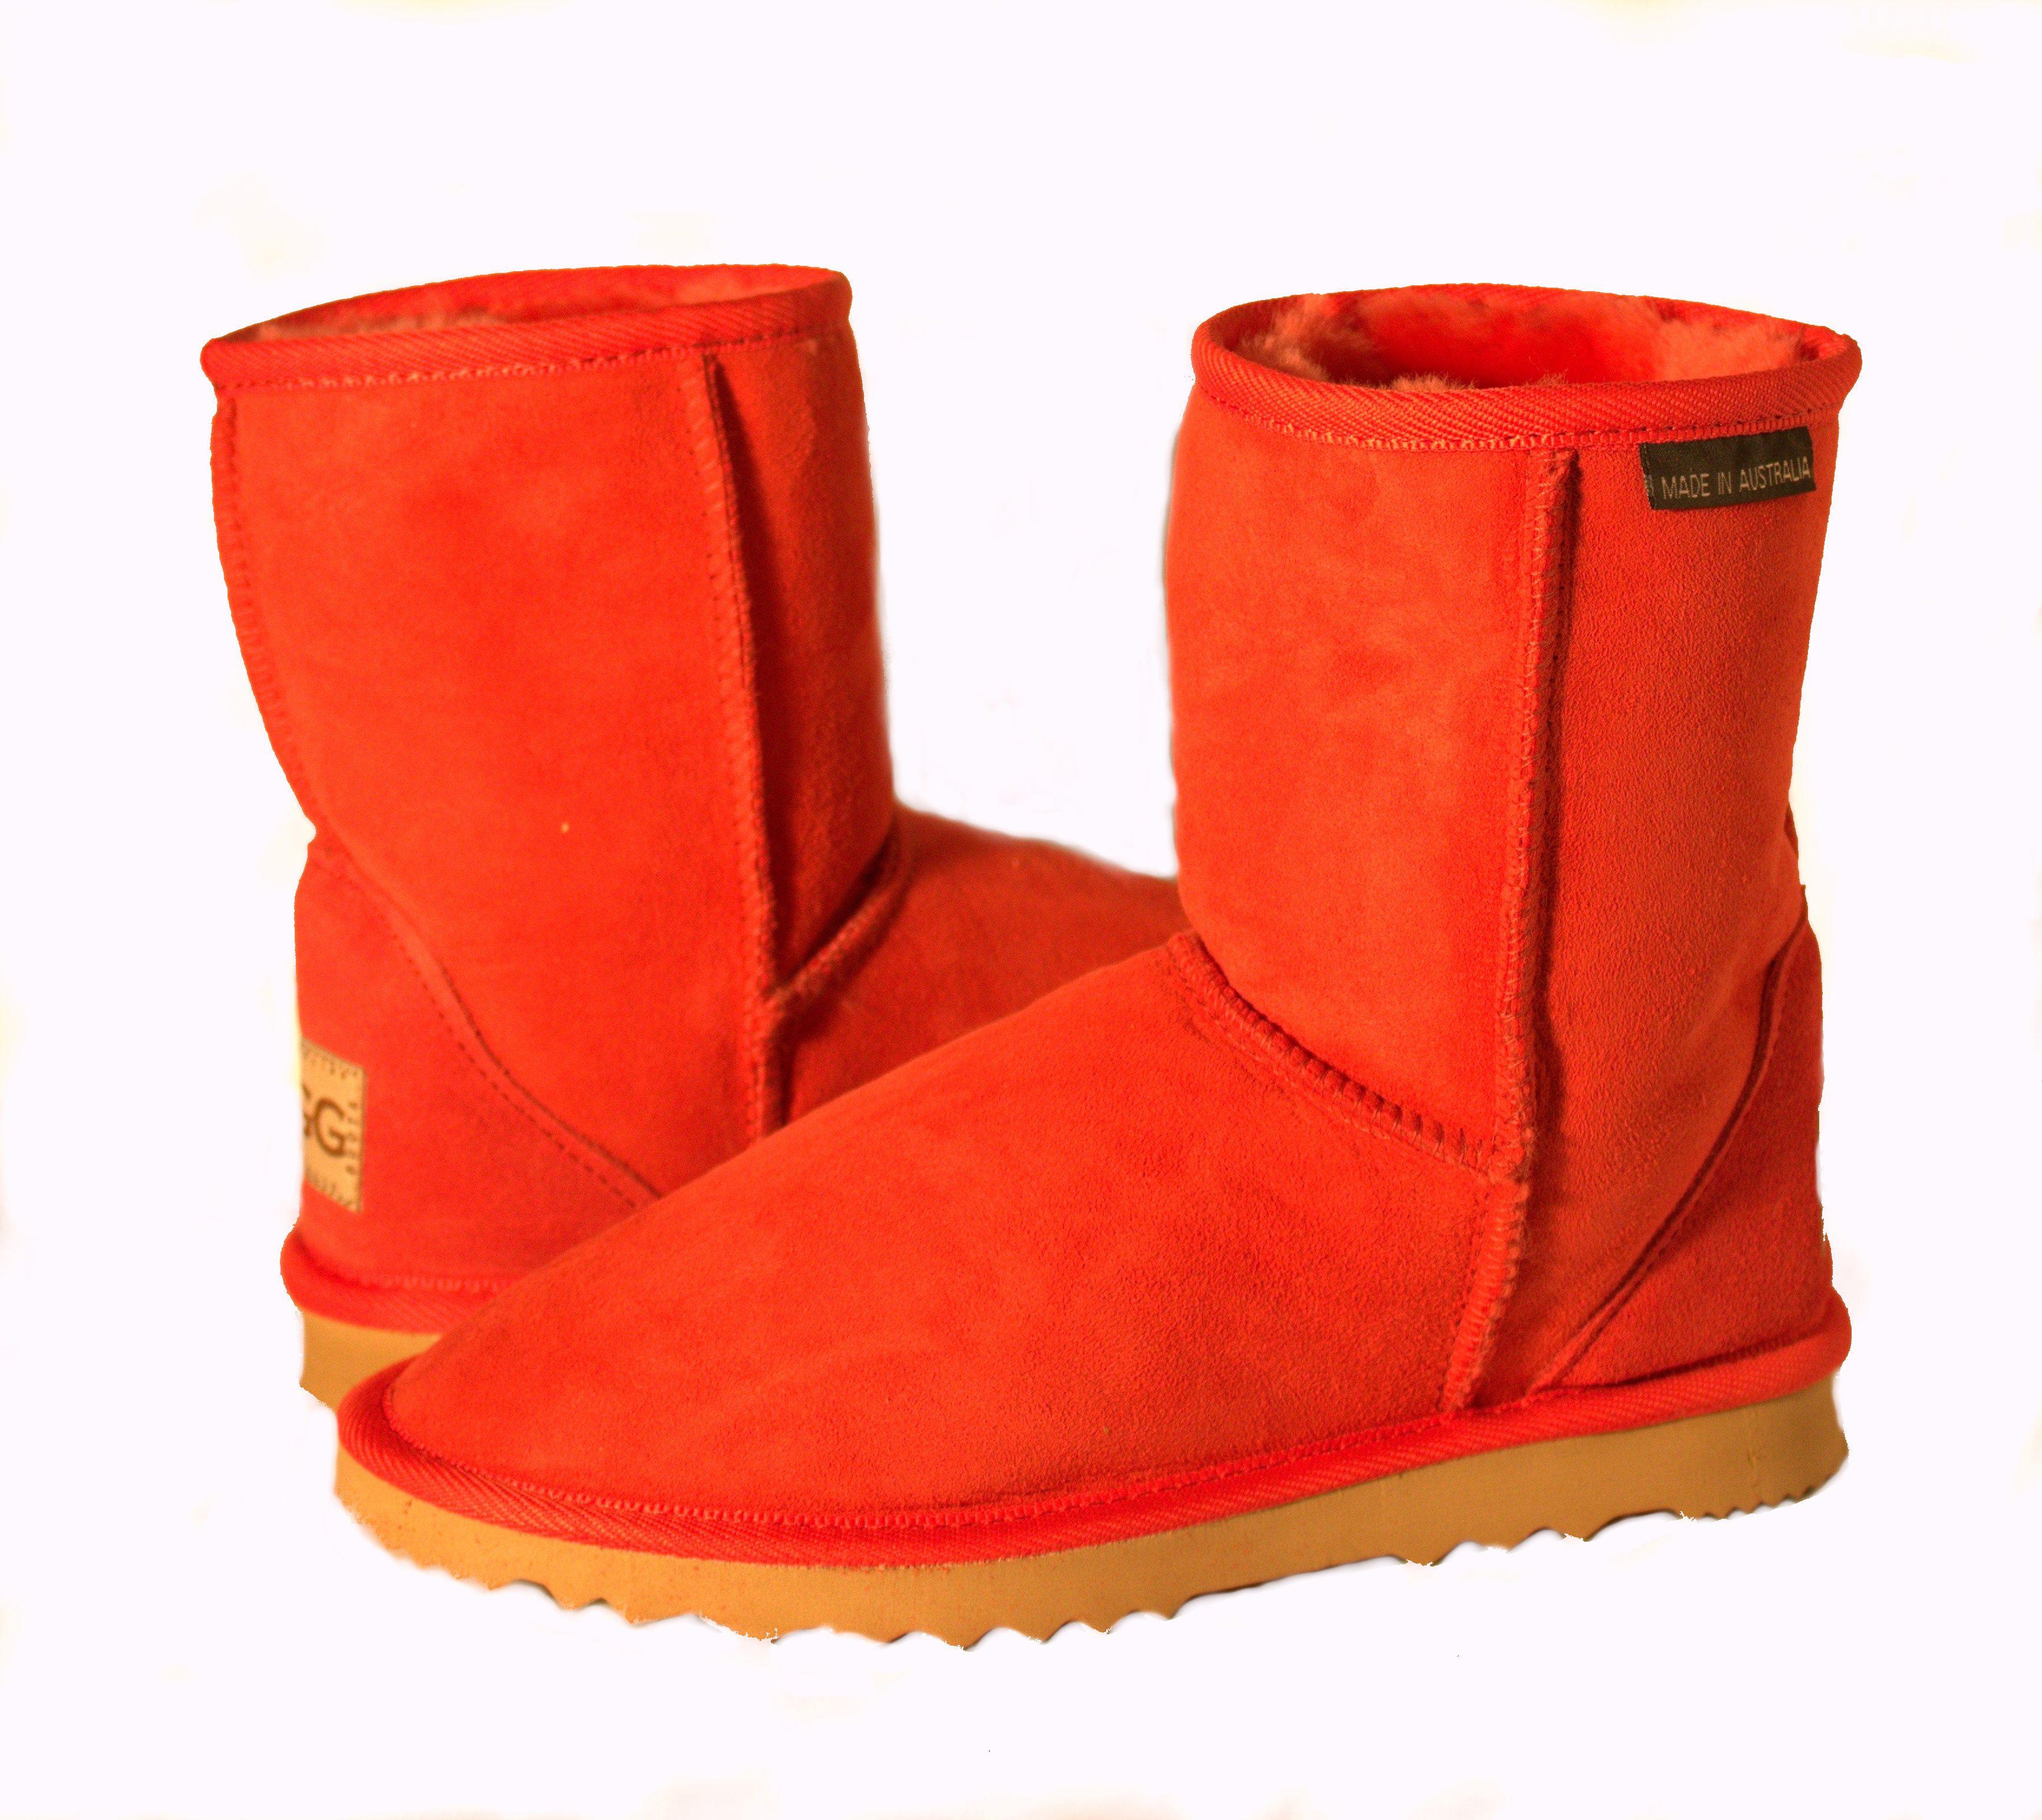 7a8cbdc6646 spain melbourne ugg boots store 1e04a 870ac